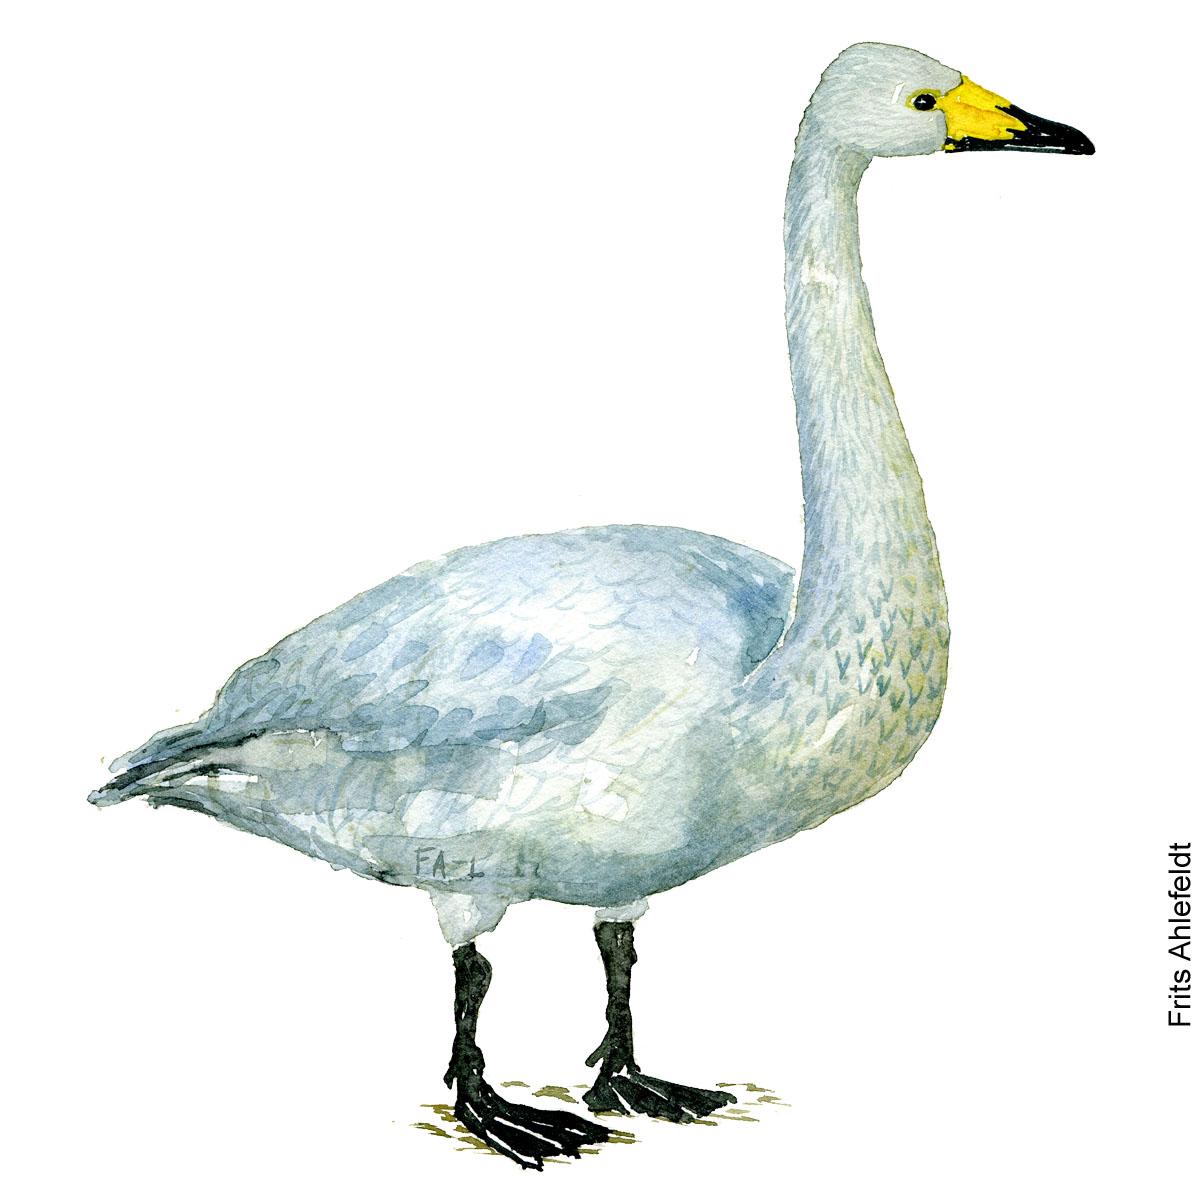 Whooper swan. Bird watercolor illustration handmade by Frits Ahlefeldt